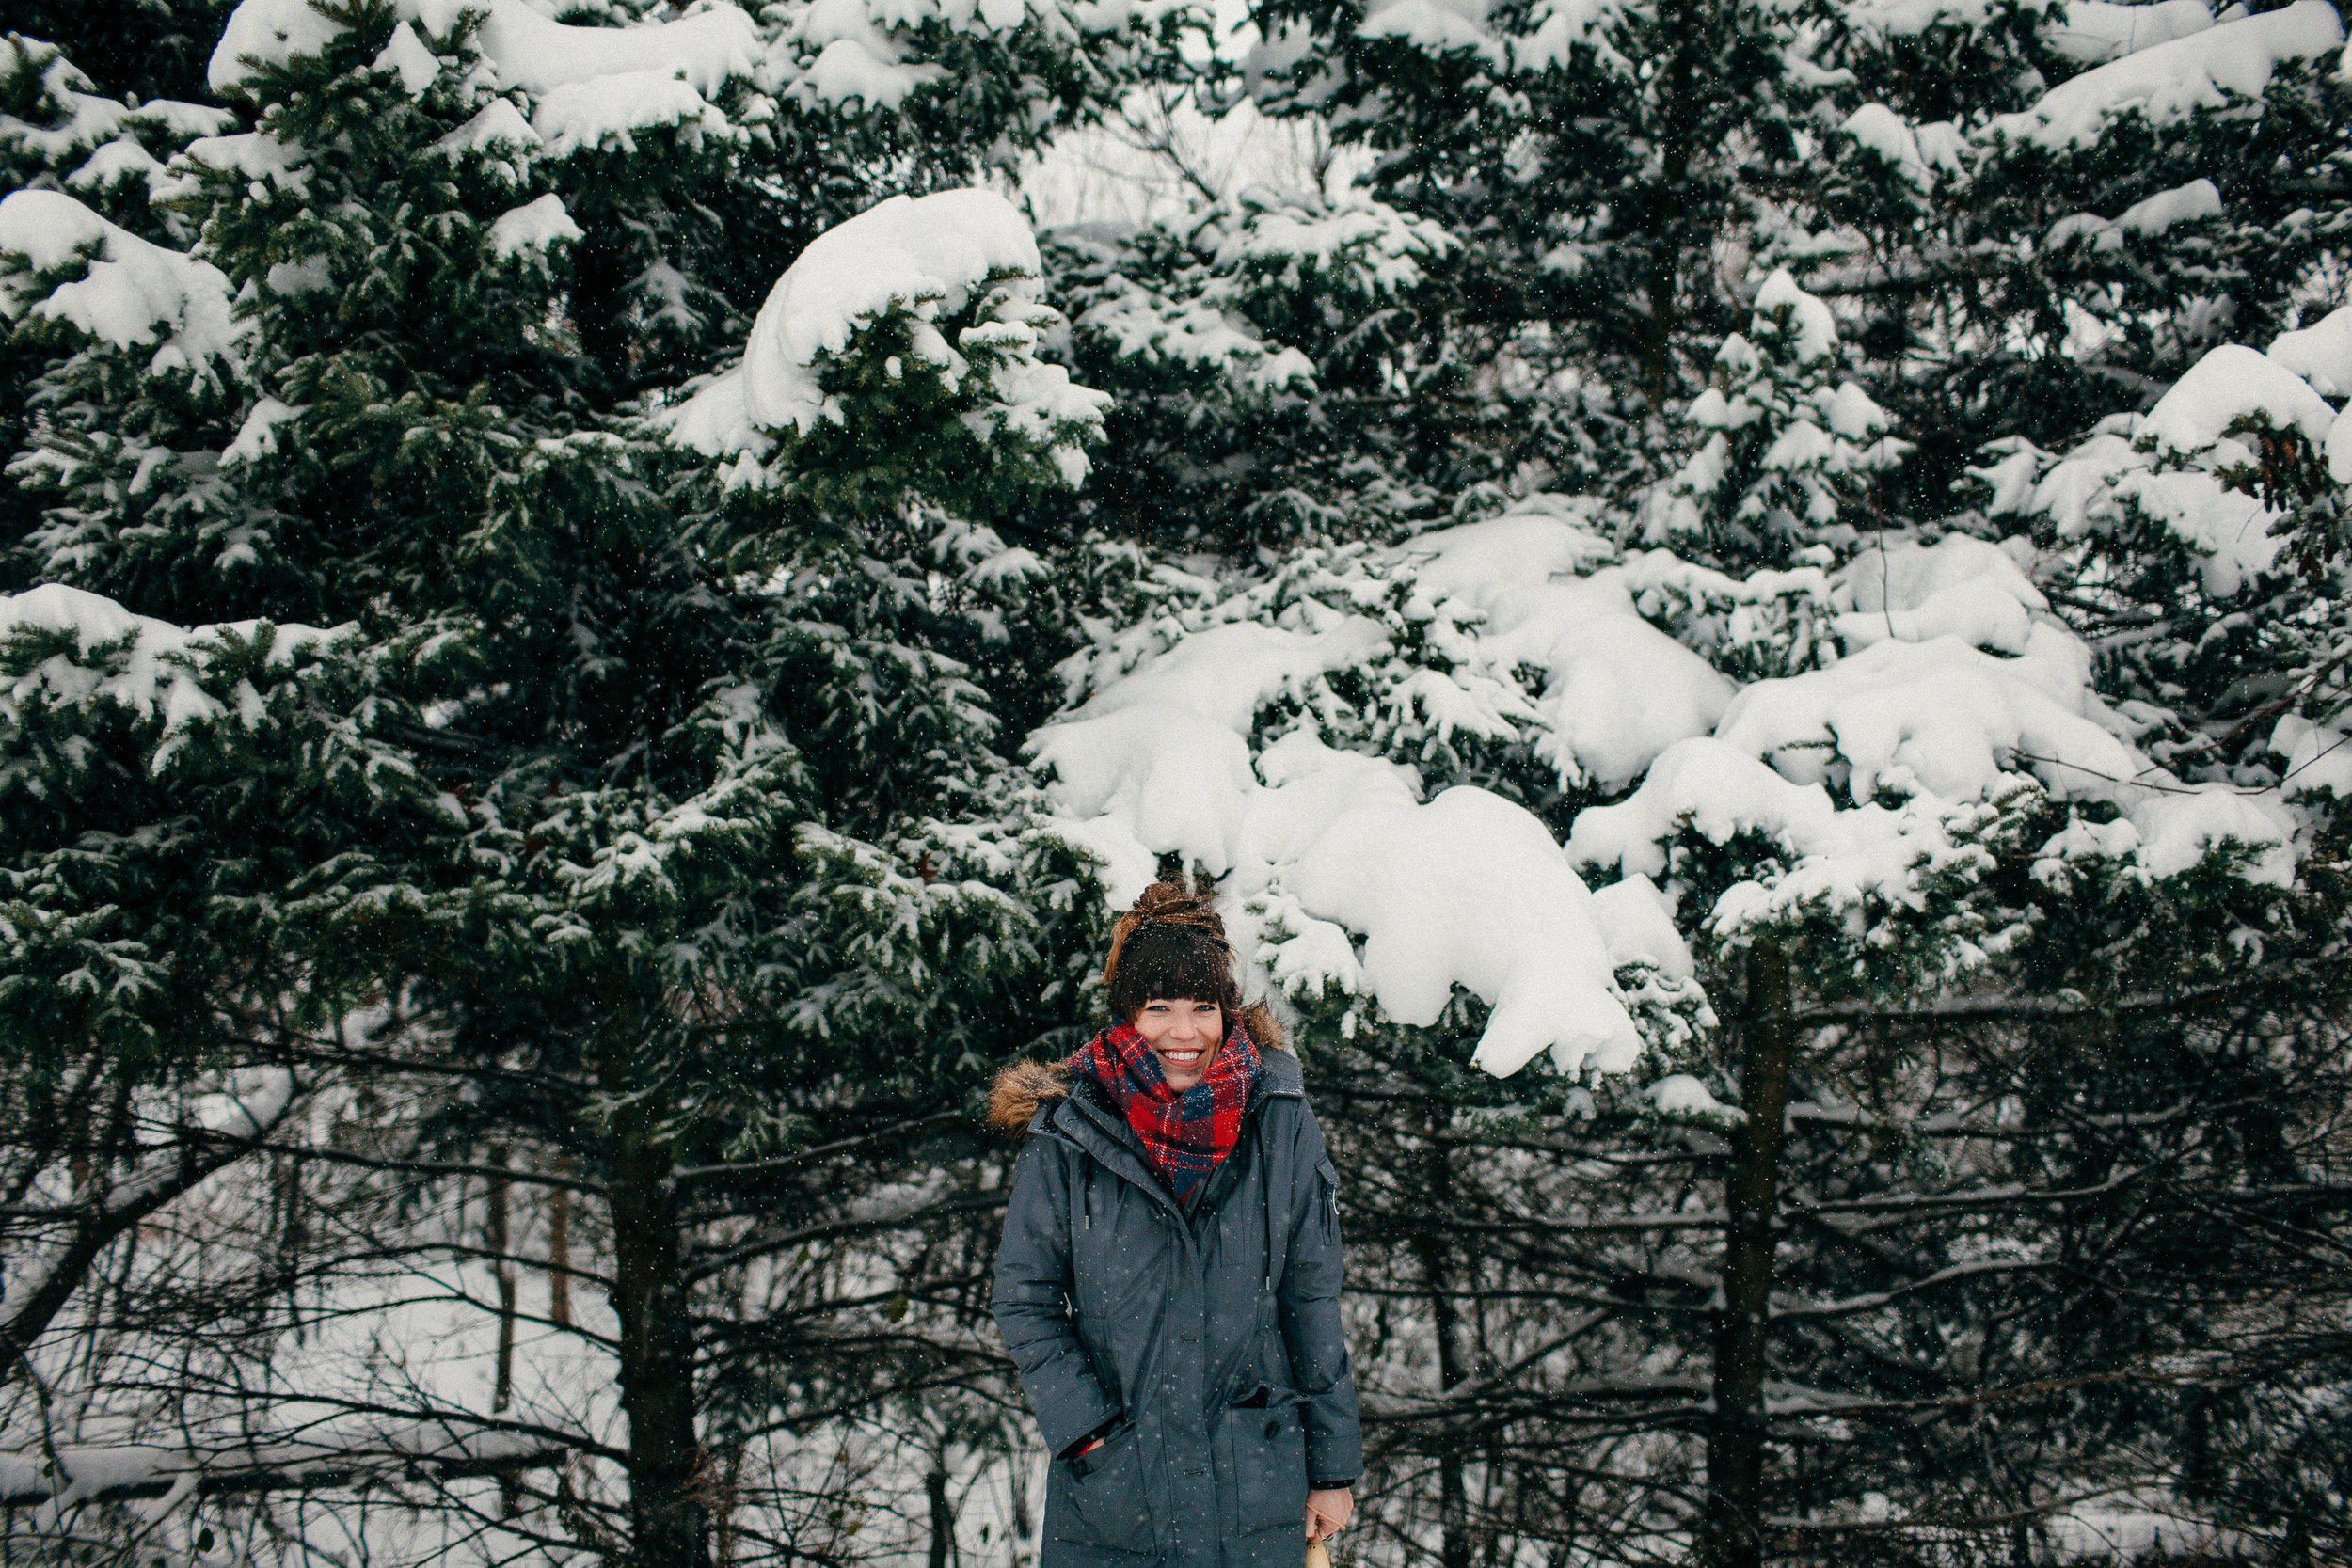 pure-michigan-winter3.JPG